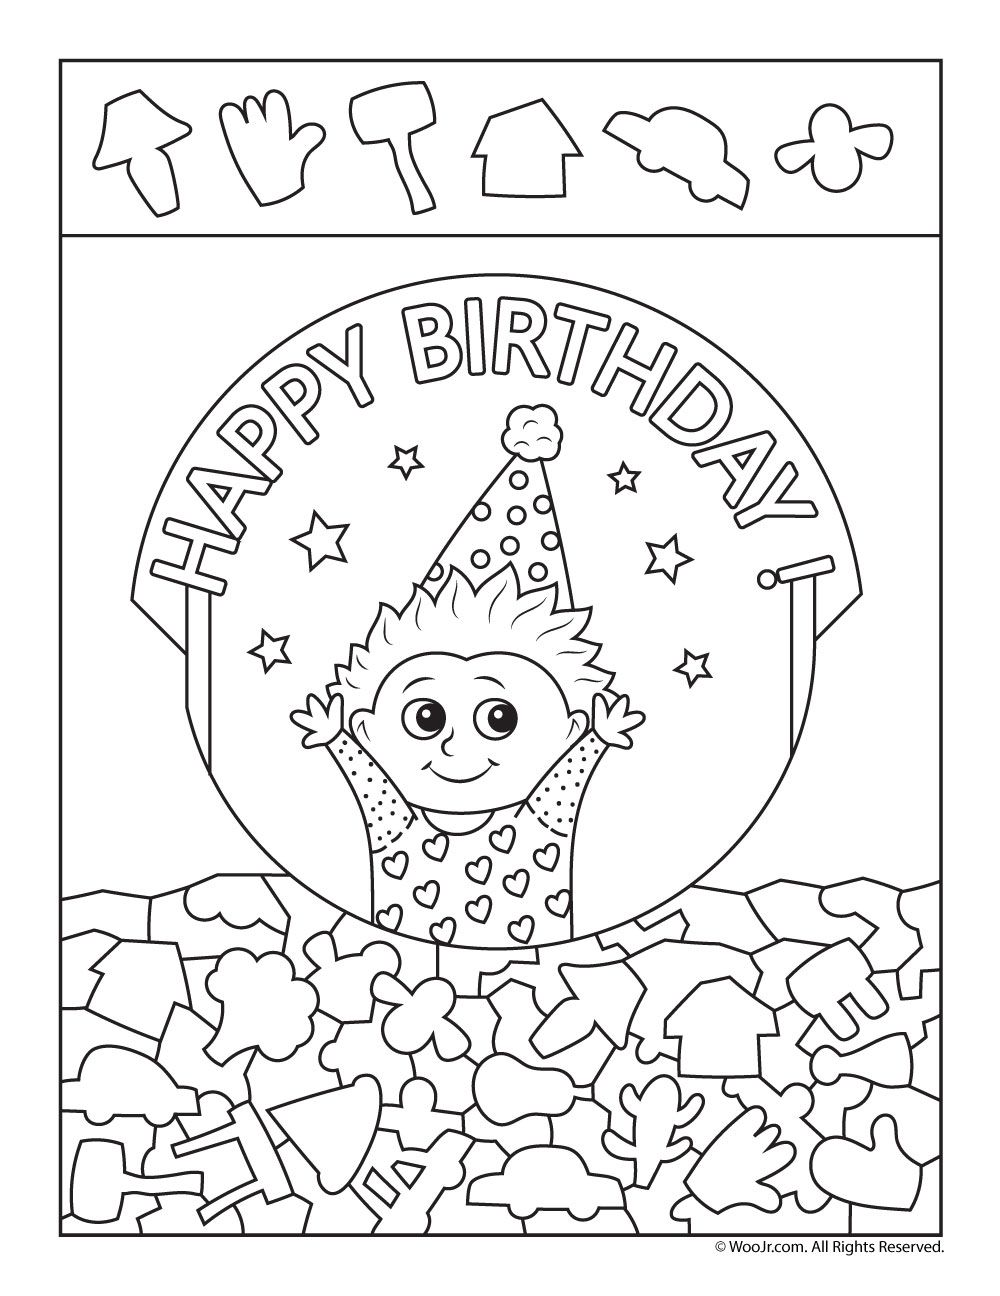 Birthday Hidden Pictures Activity Pages Woo Jr Kids Activities Hidden Pictures Hidden Pictures Printables Hidden Picture Puzzles [ 1296 x 1000 Pixel ]